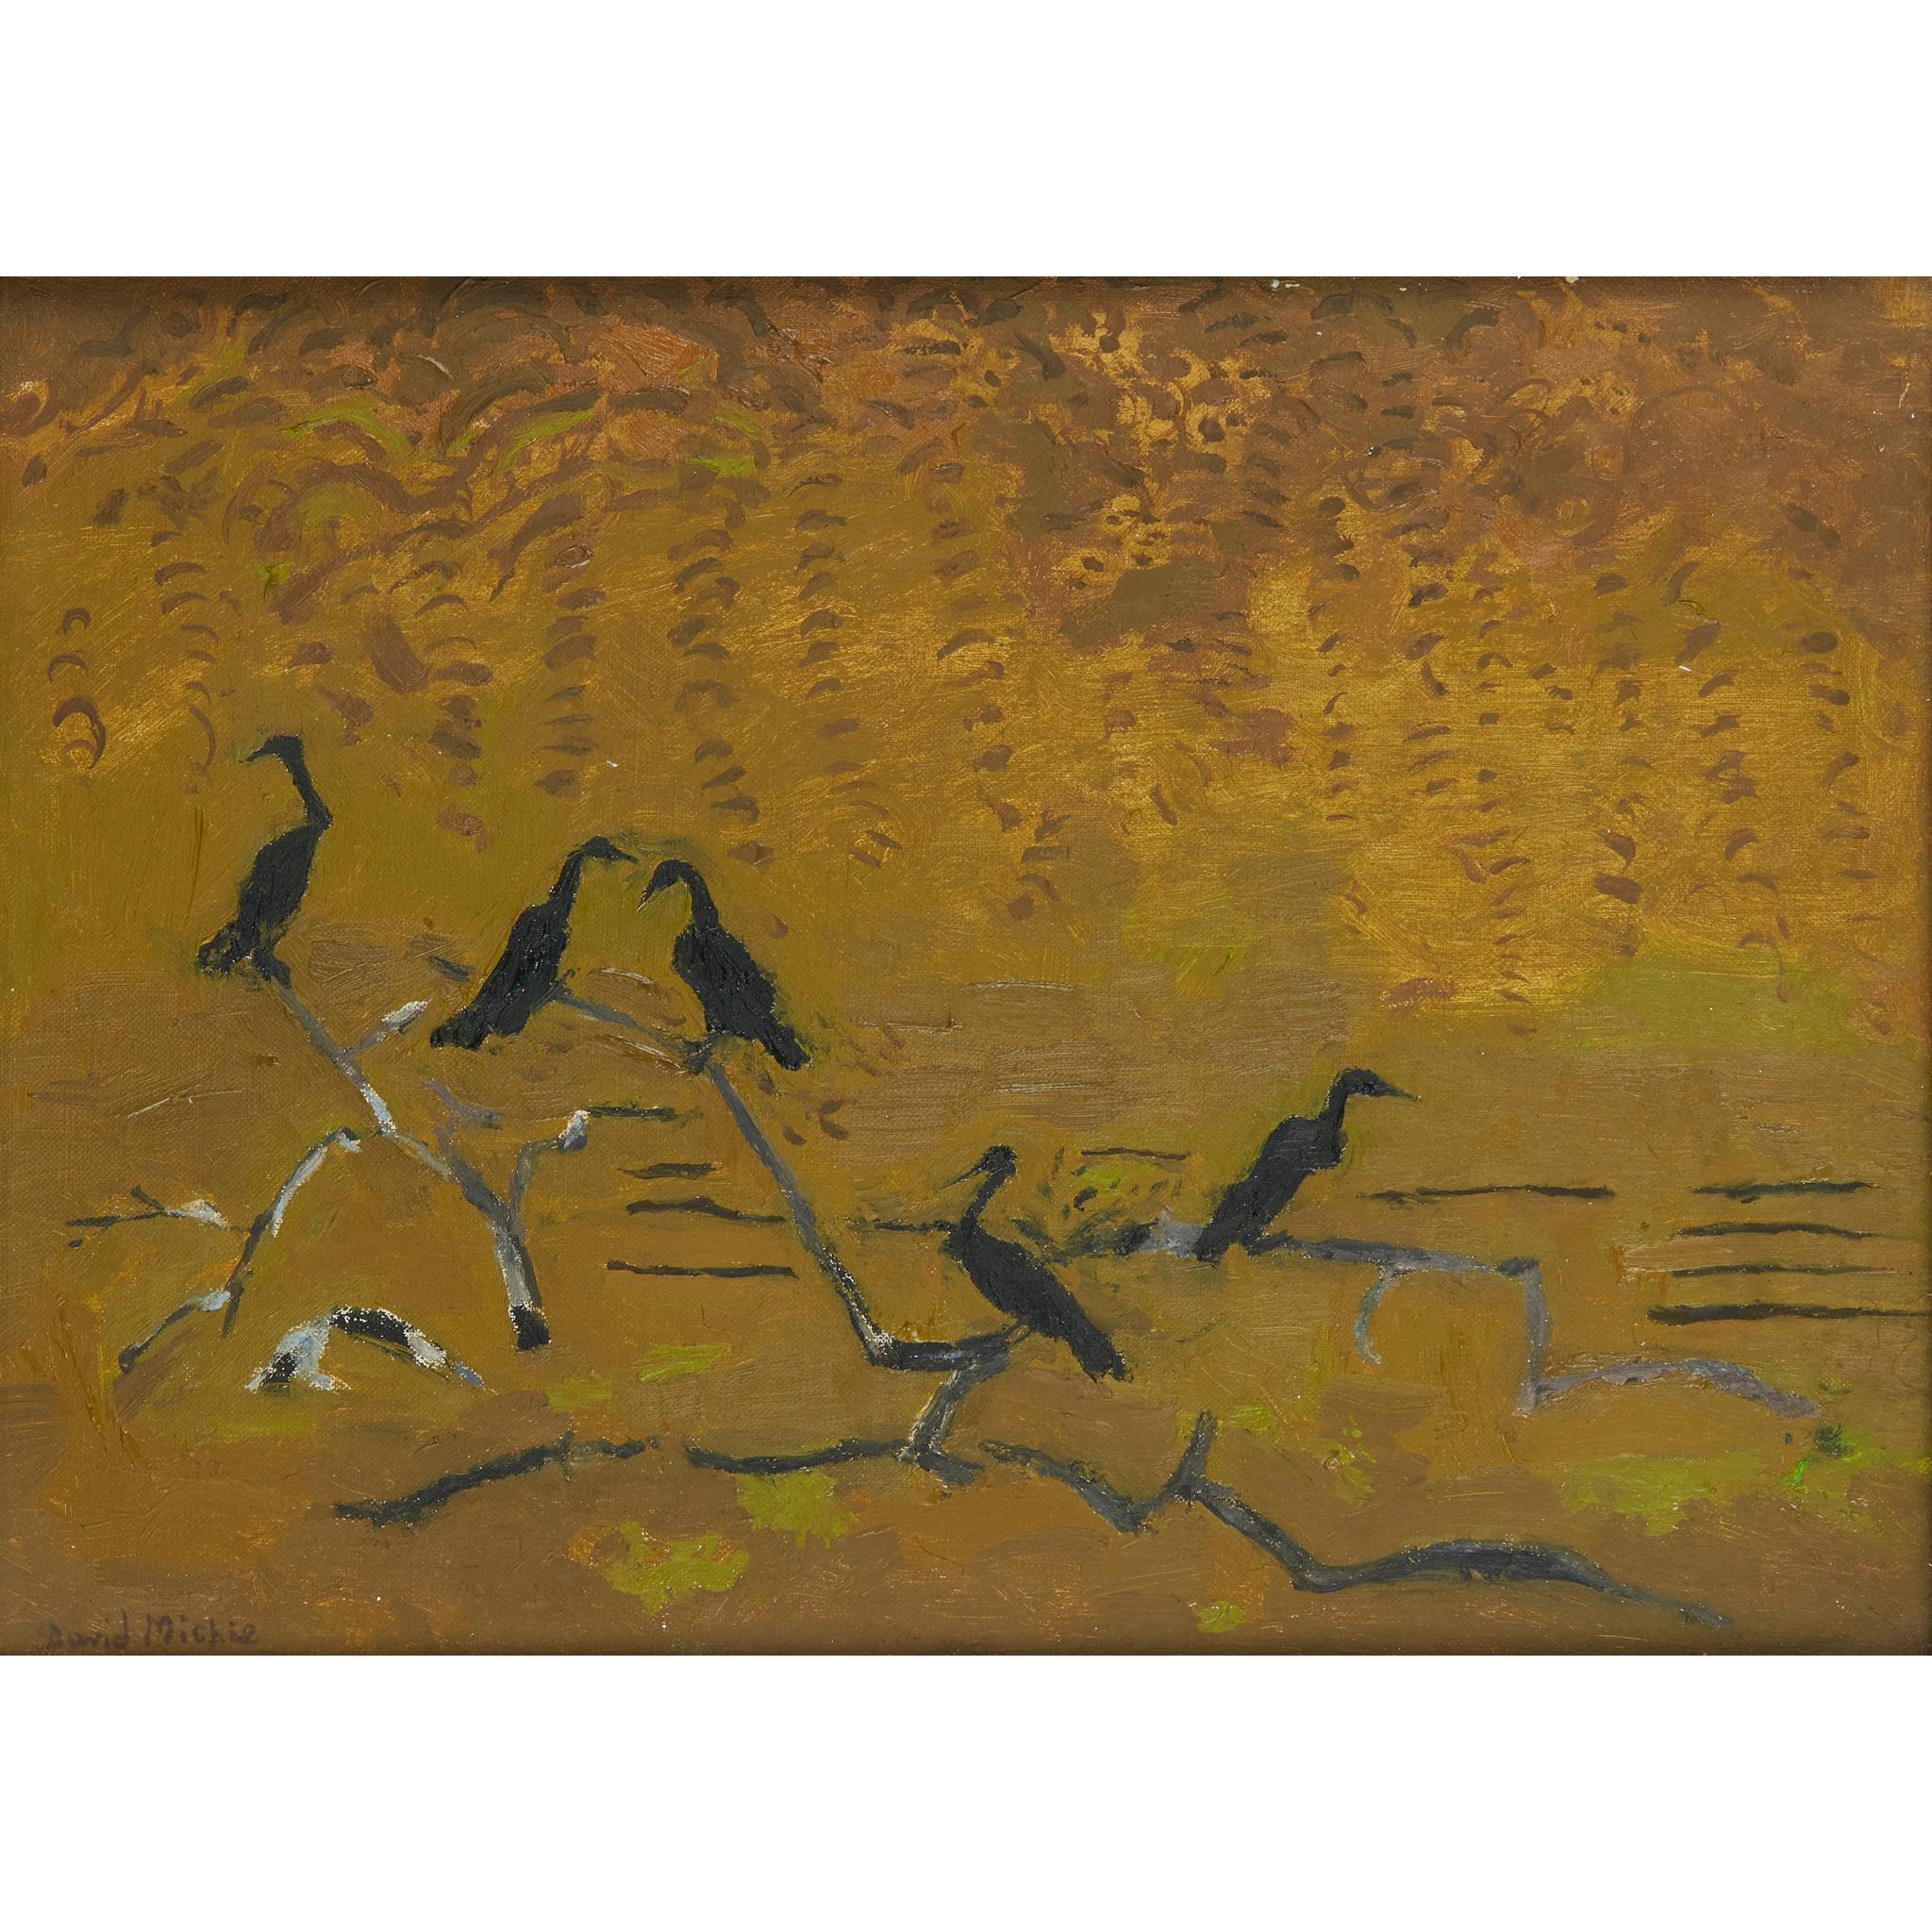 § DAVID MICHIE O.B.E., R.S.A., R.G.I., F.R.S.A (SCOTTISH 1928-2015) CORMORANTS IN THE LAGOON, SANTA